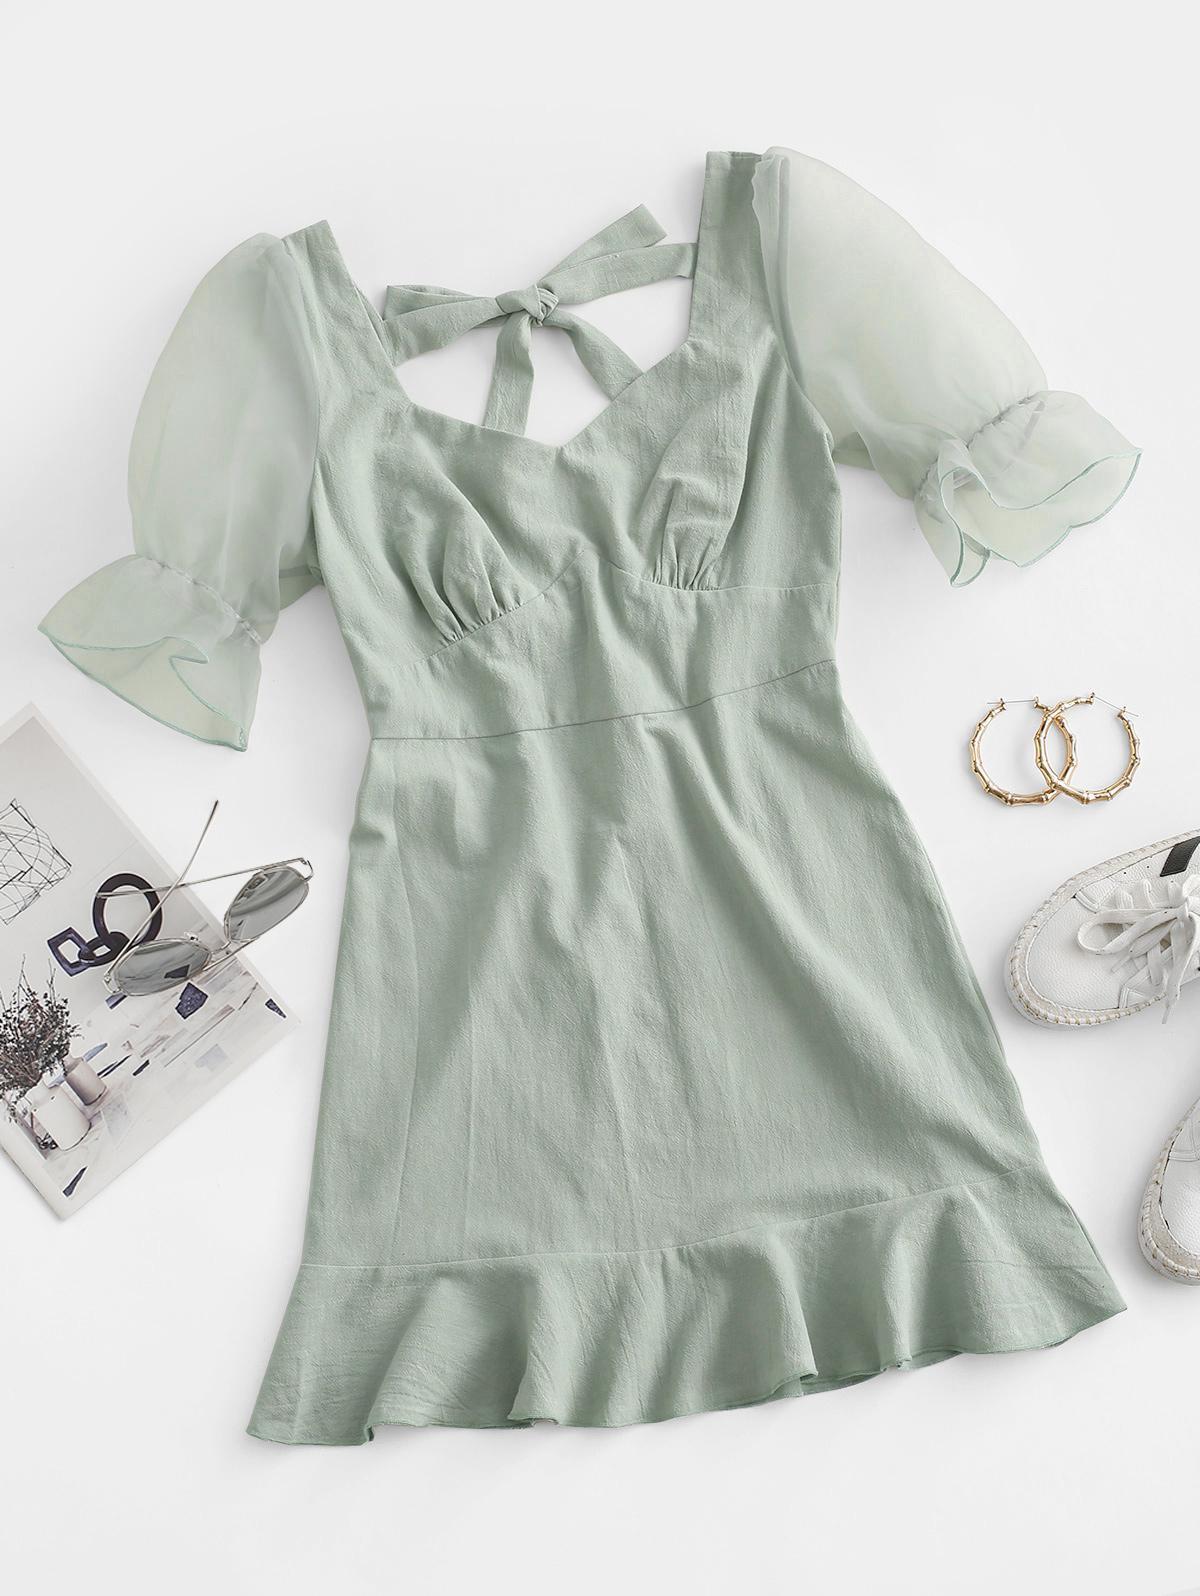 ZAFUL Ruffled Hem Tie Back Organza Sleeve Dress